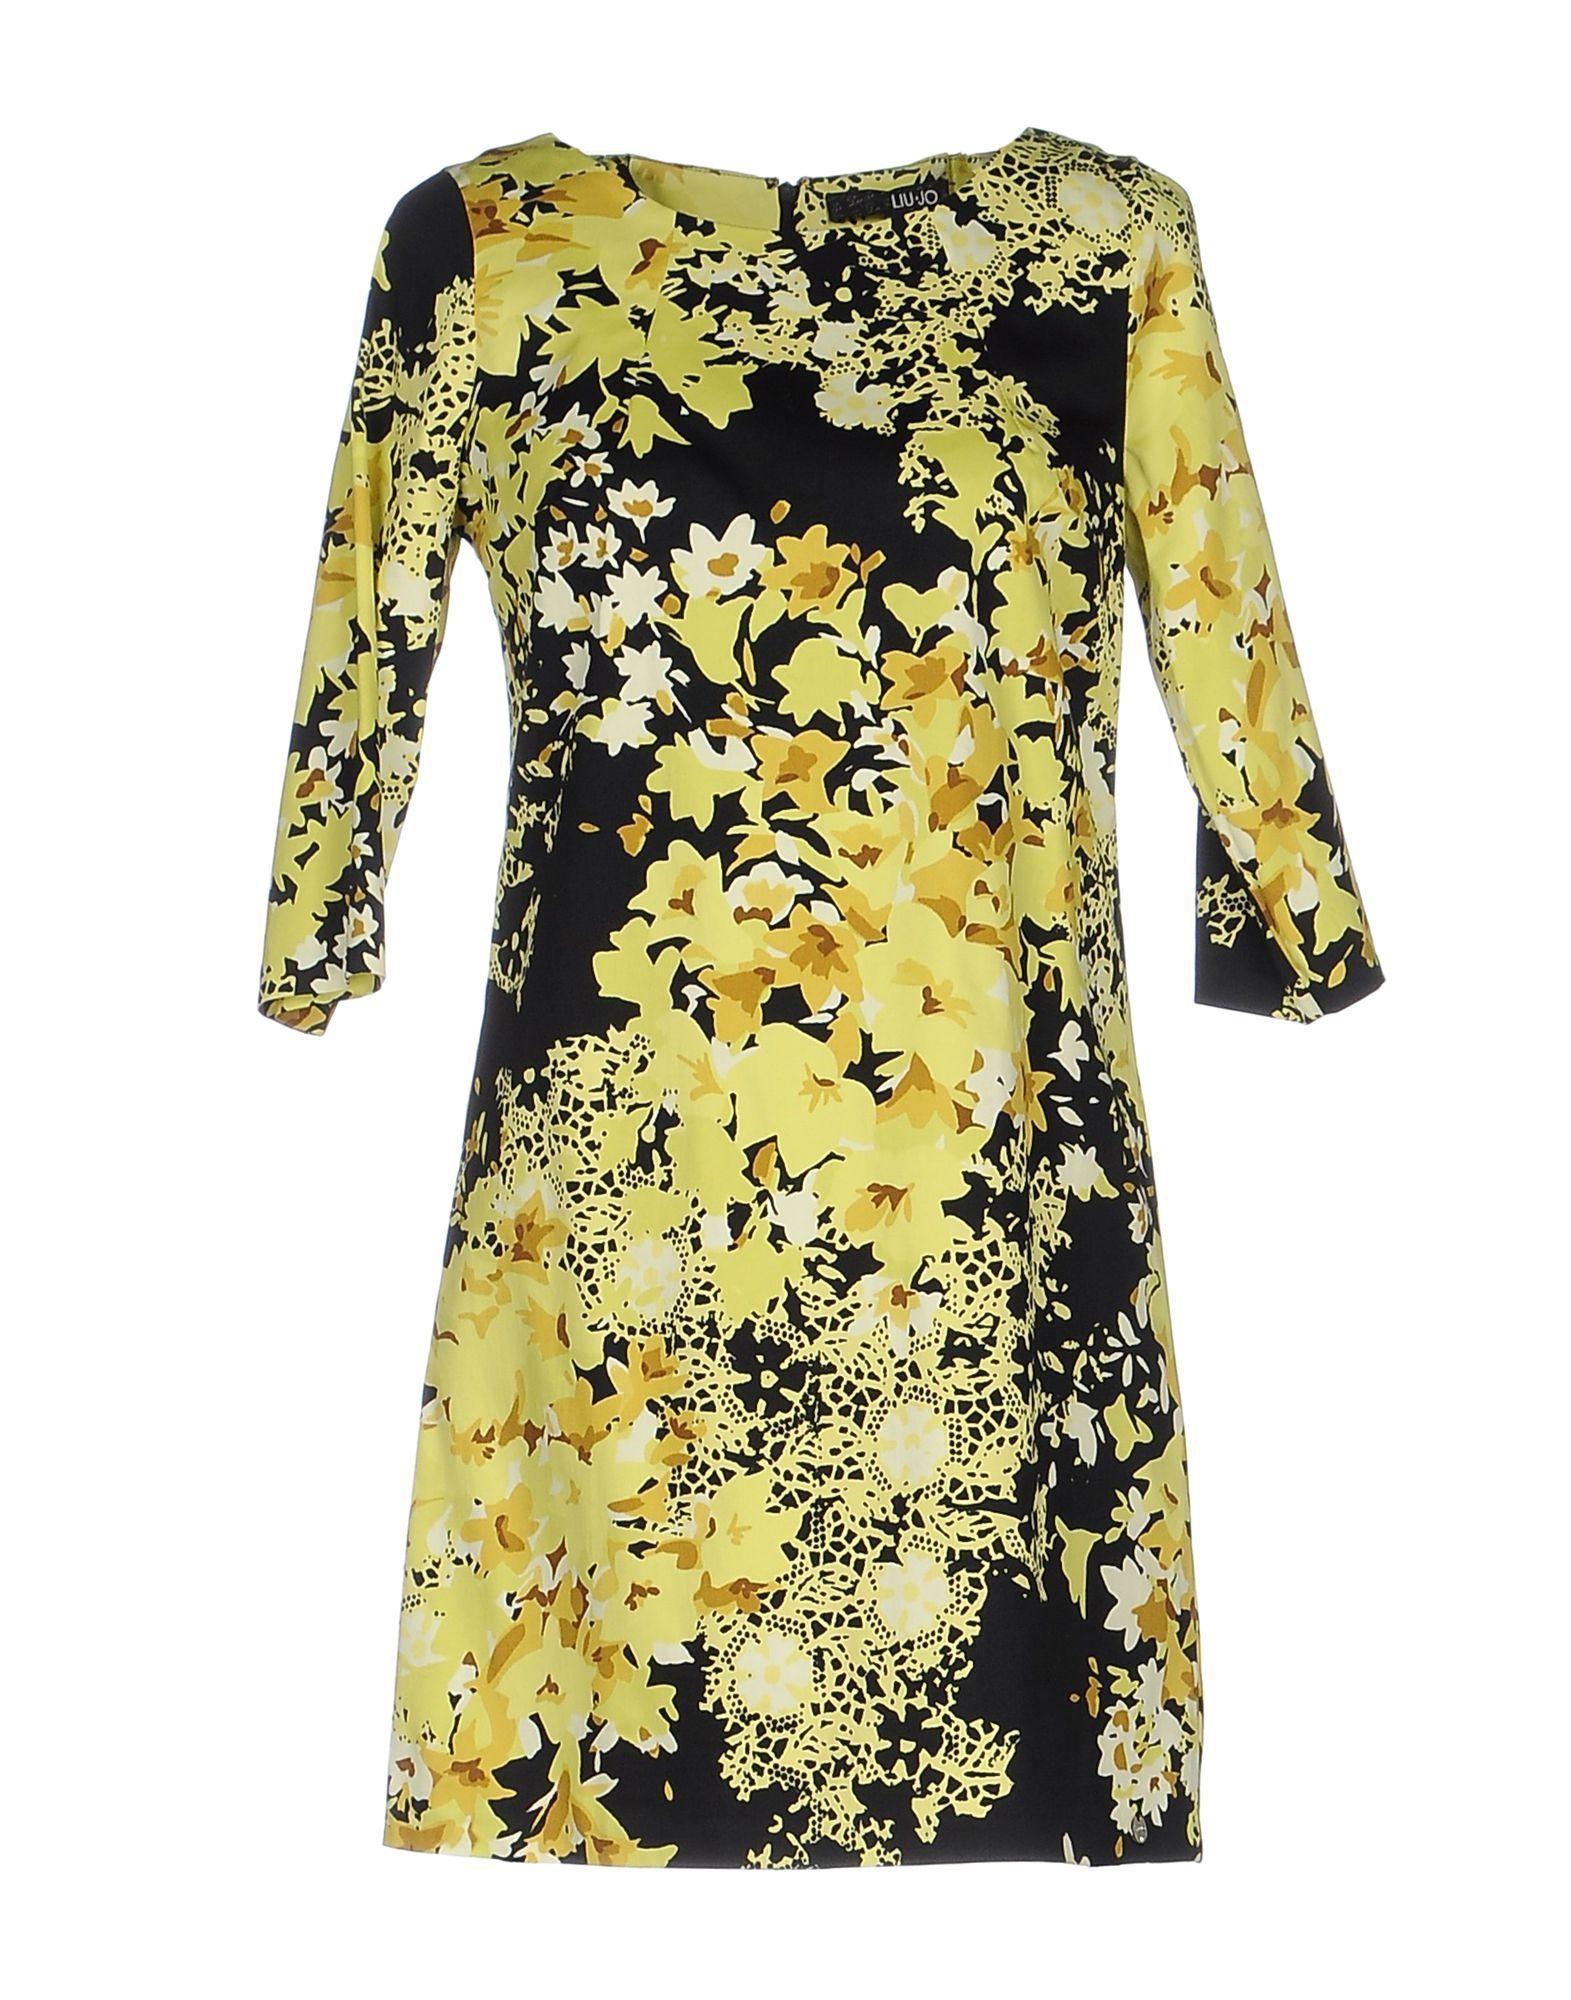 Liu Jo Yellow Print Cotton Short Dress